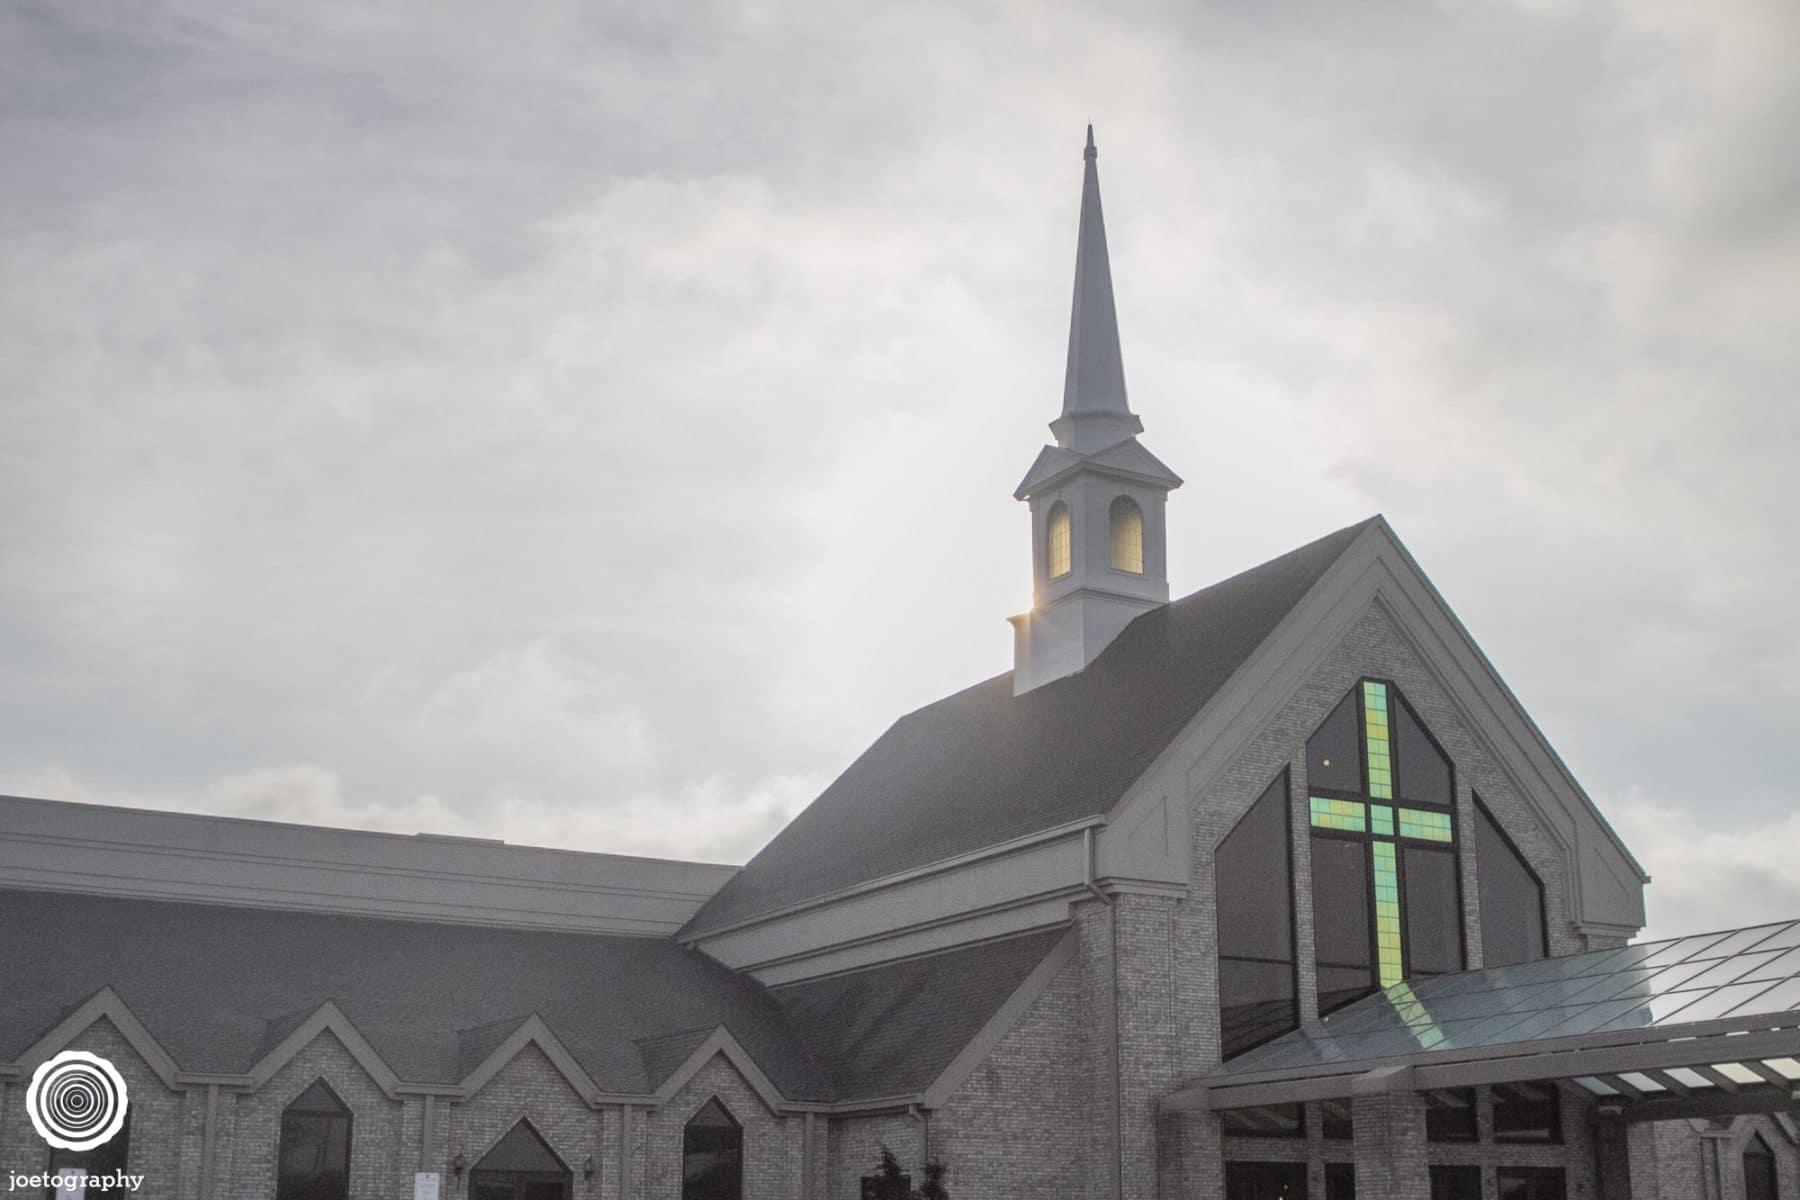 eastern-star-church-indianapolis-389